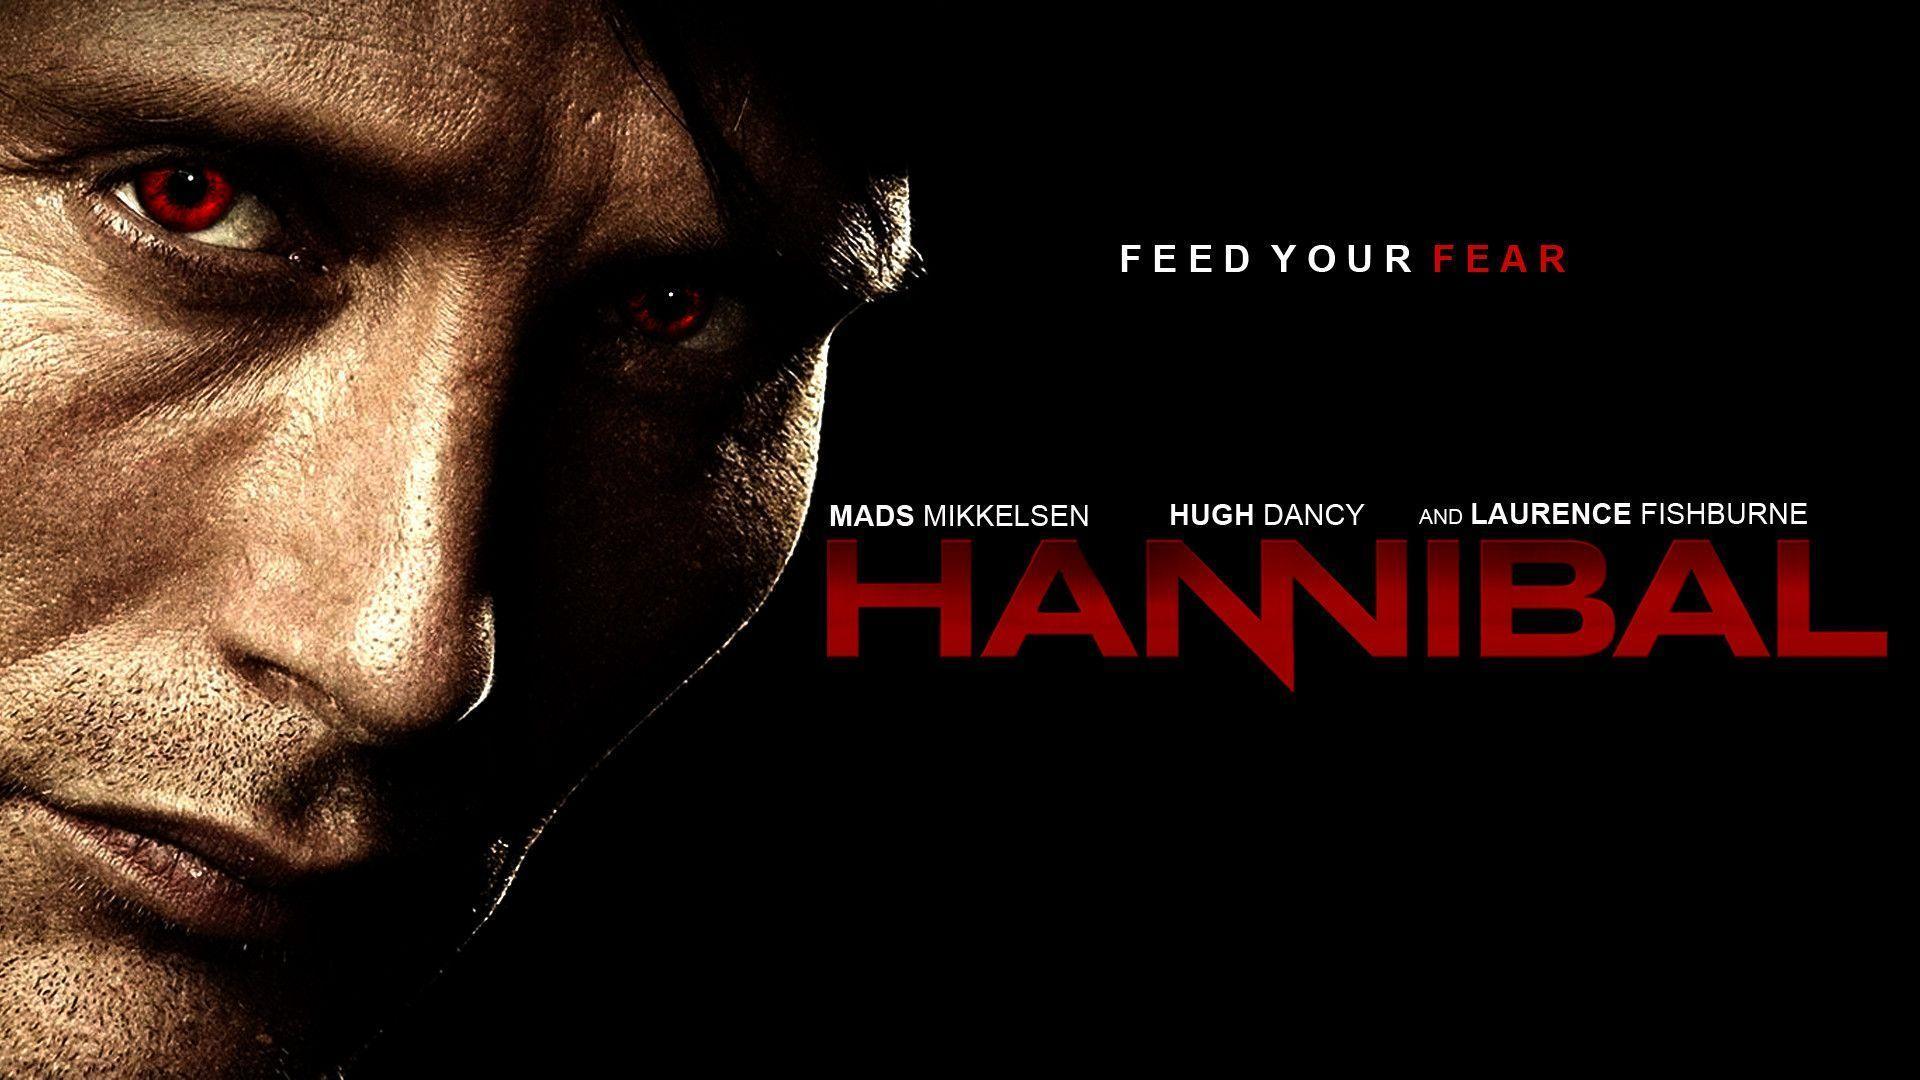 Hannibal Series Wallpaper